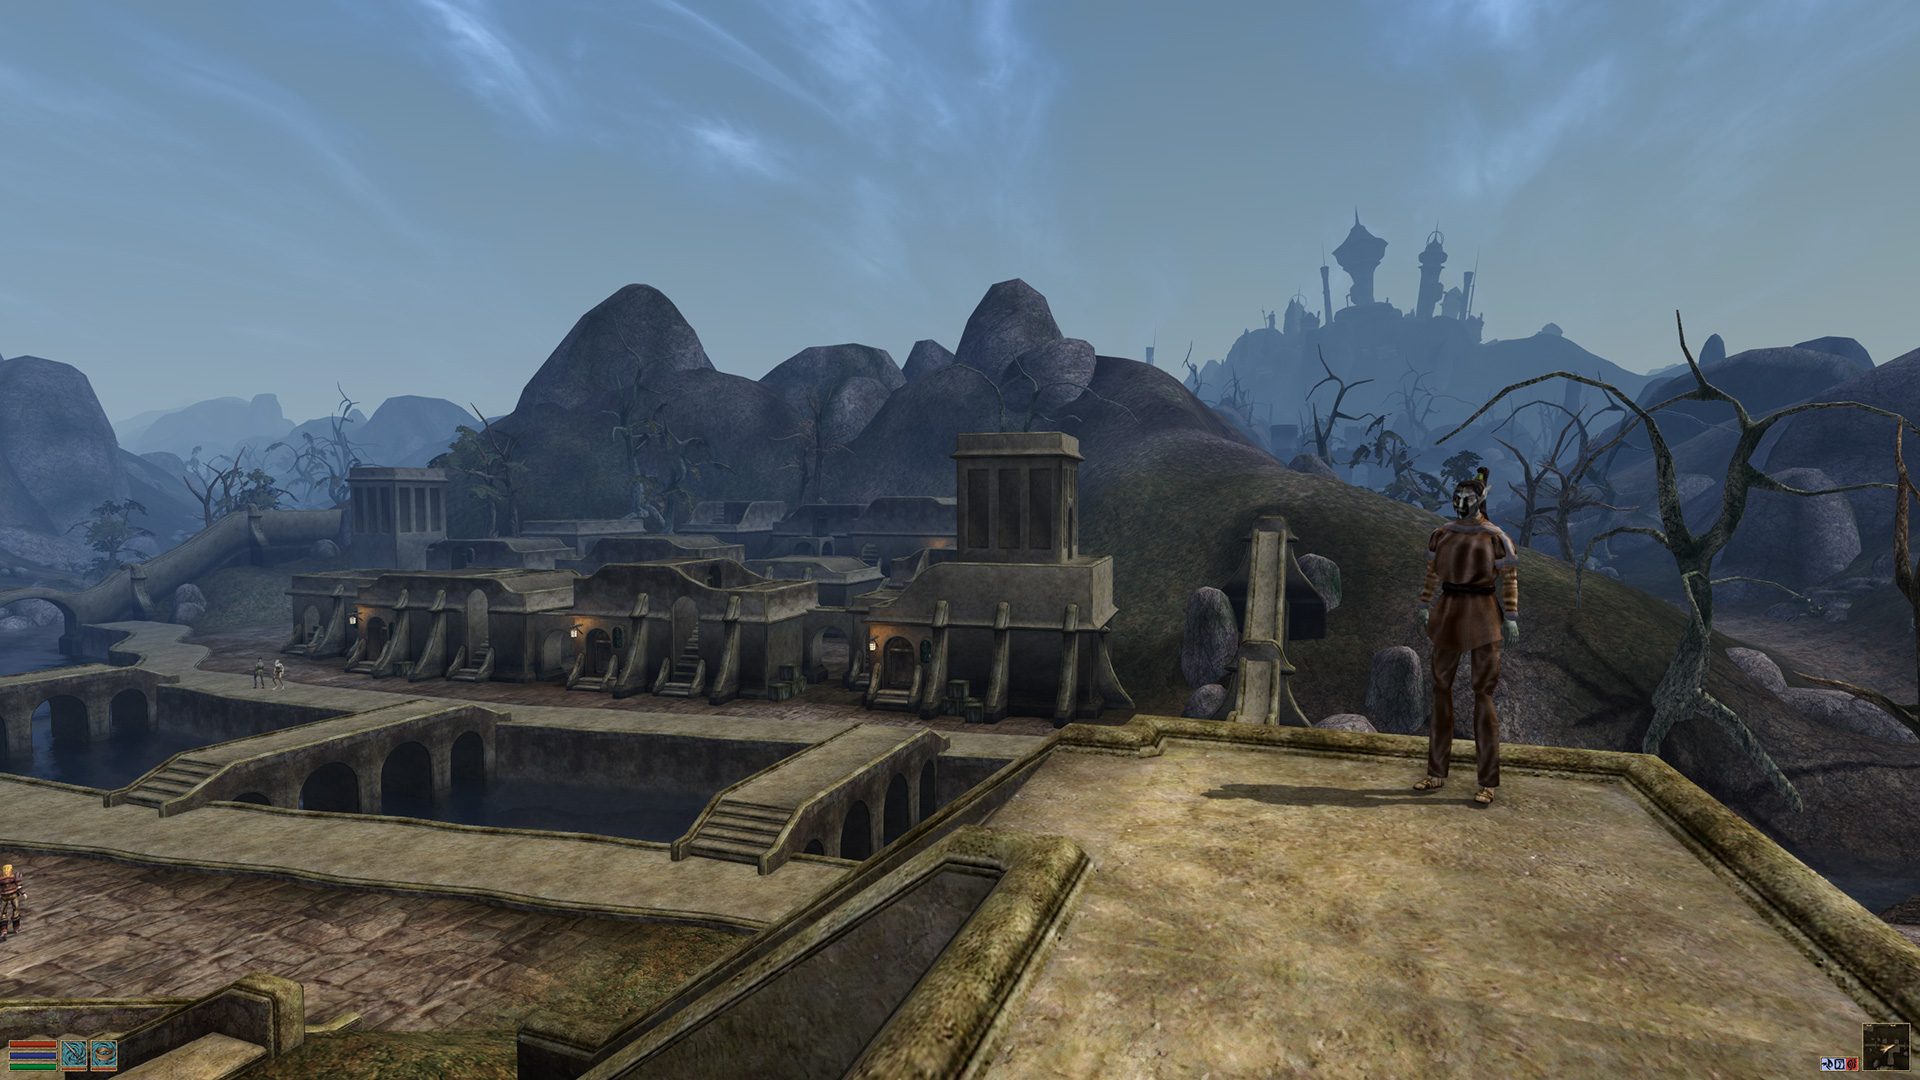 Best Morrowind Mods 2020 The most essential mods for Morrowind | Rock Paper Shotgun